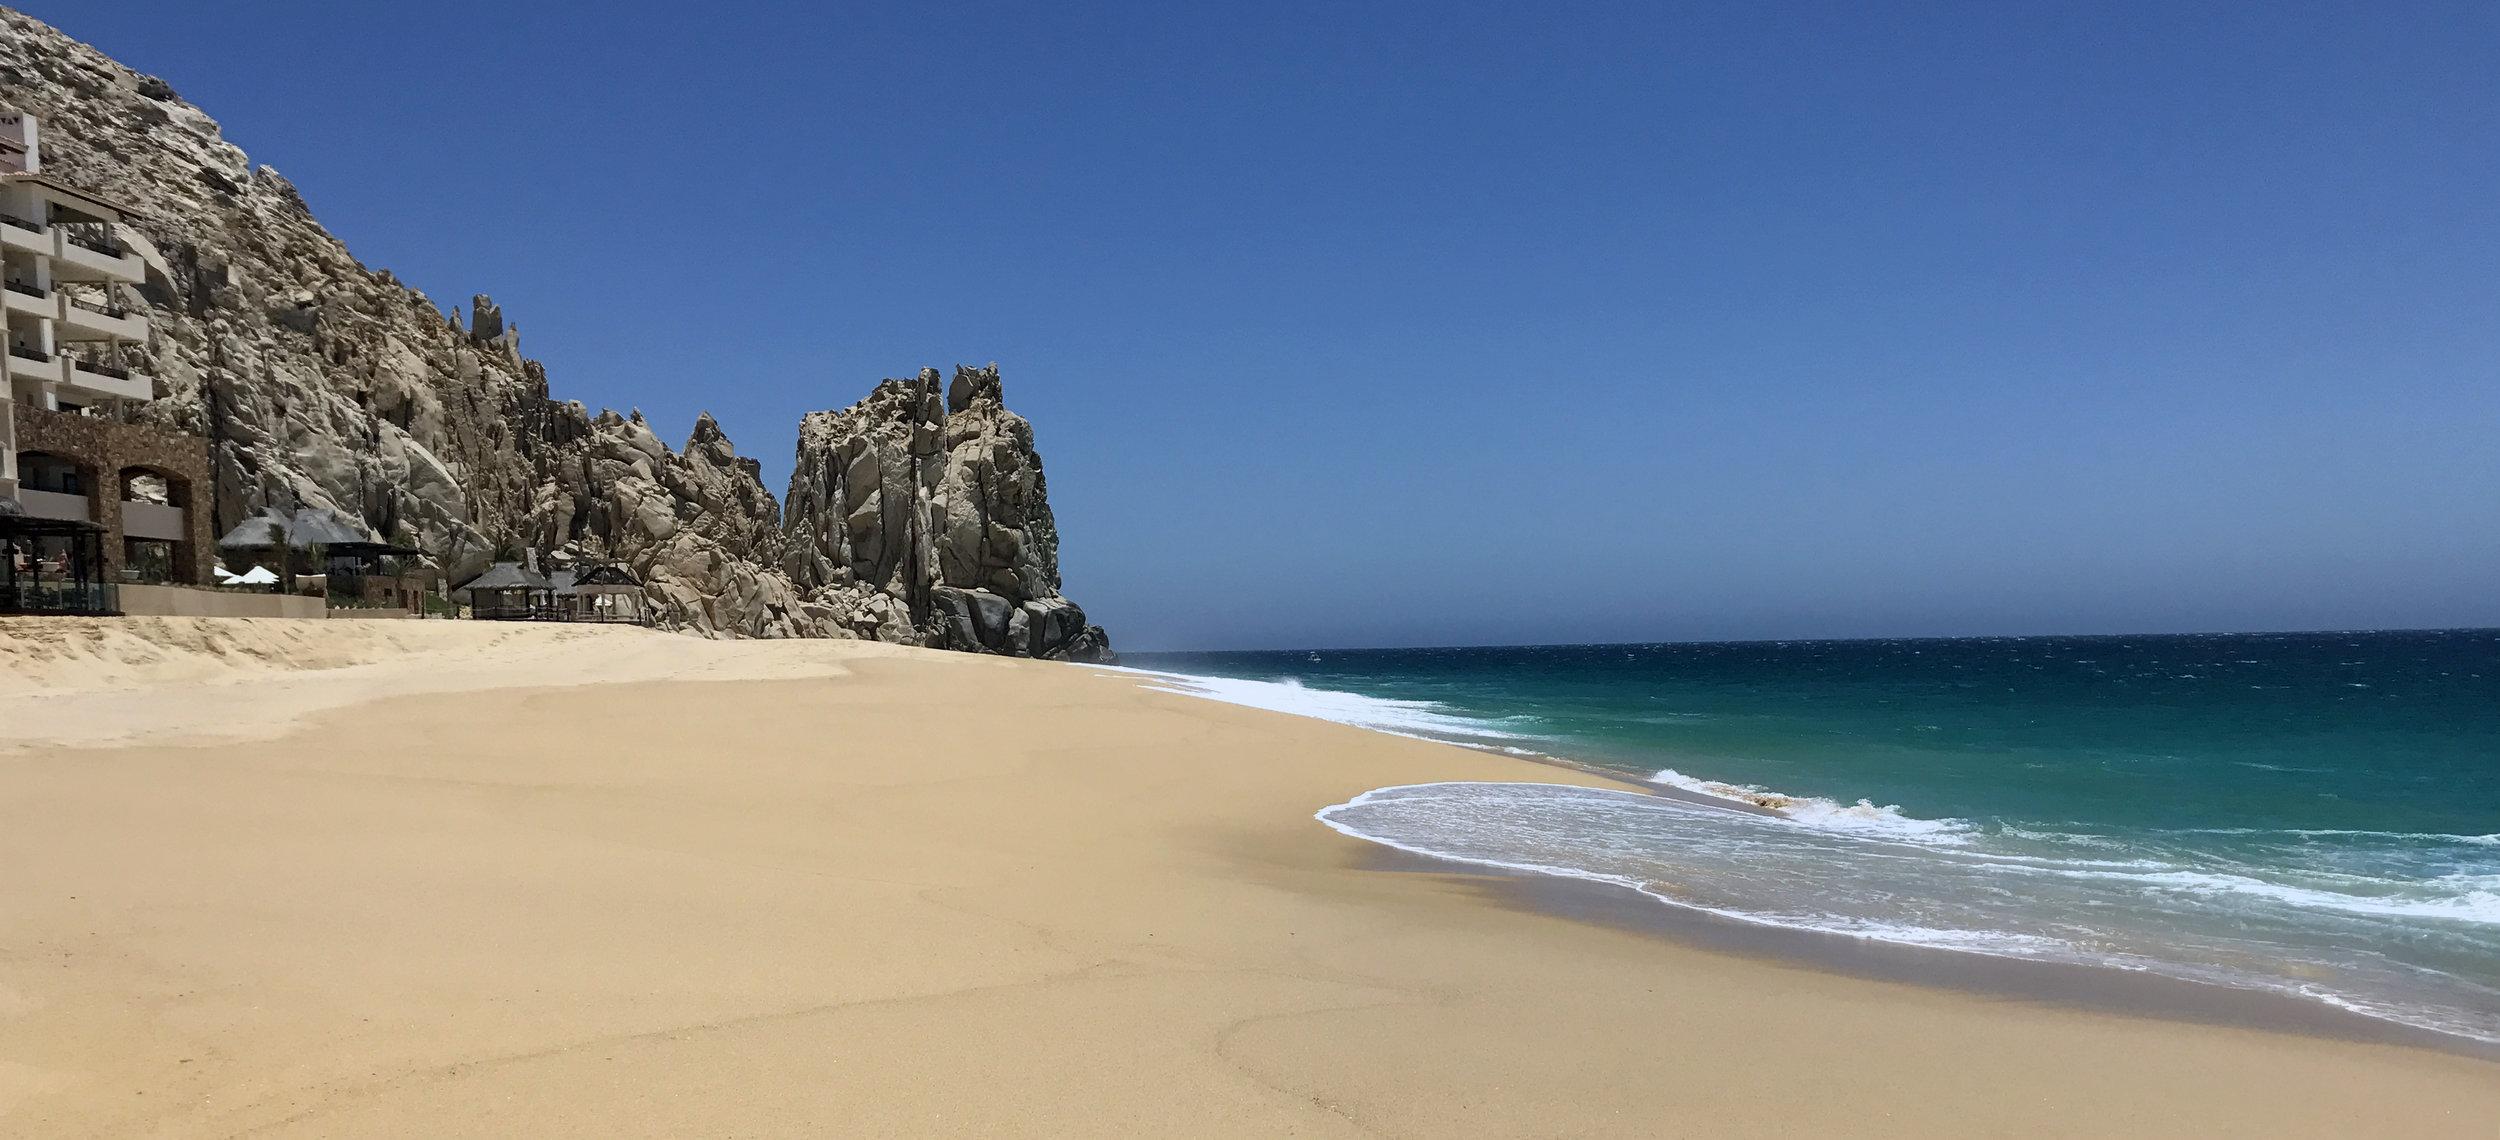 Beautiful beaches of Cabo San Lucas - Stephanie Arsenault - Global Dish